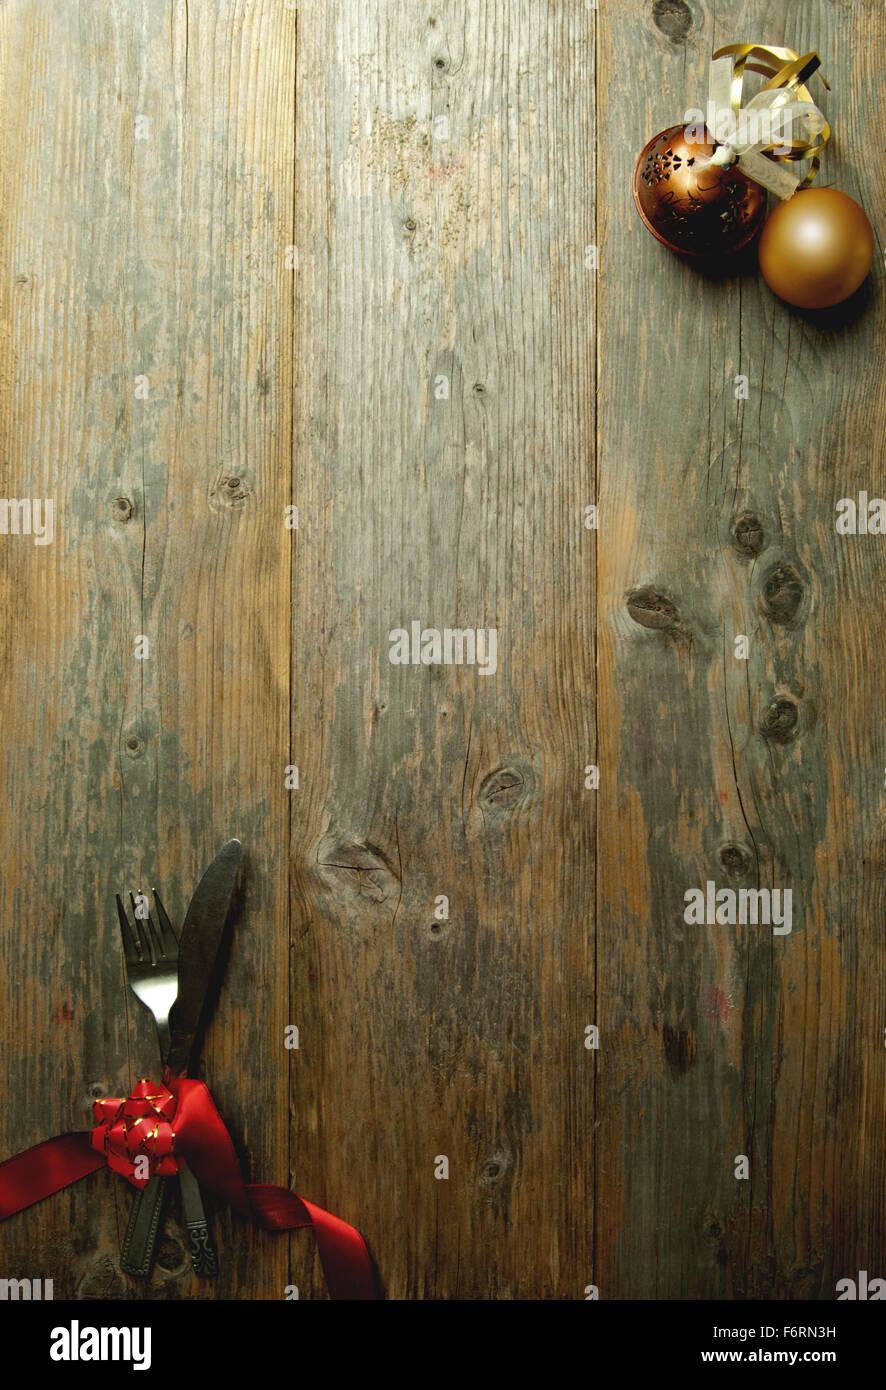 Christmas Menu Background Stock Photo 90261237 Alamy